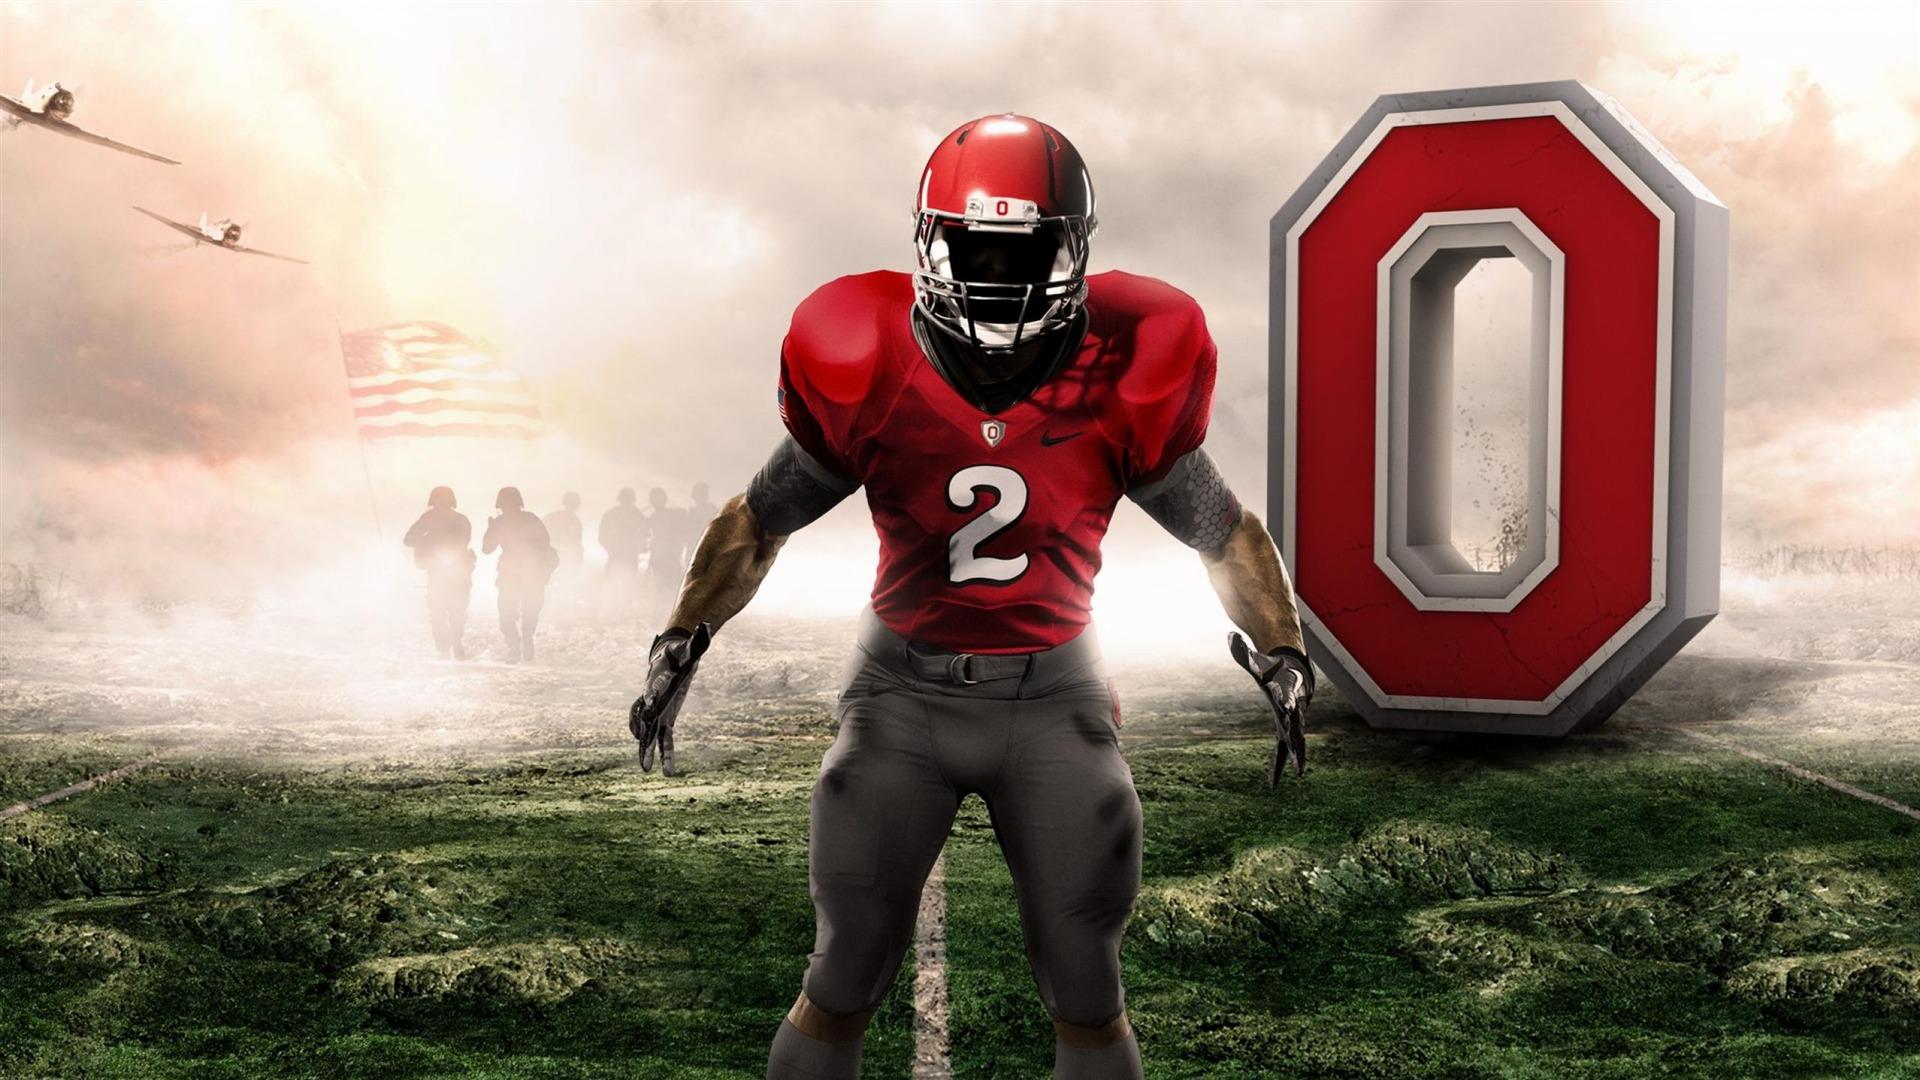 OHIO STATE BUCKEYES college football (11) wallpaper ...